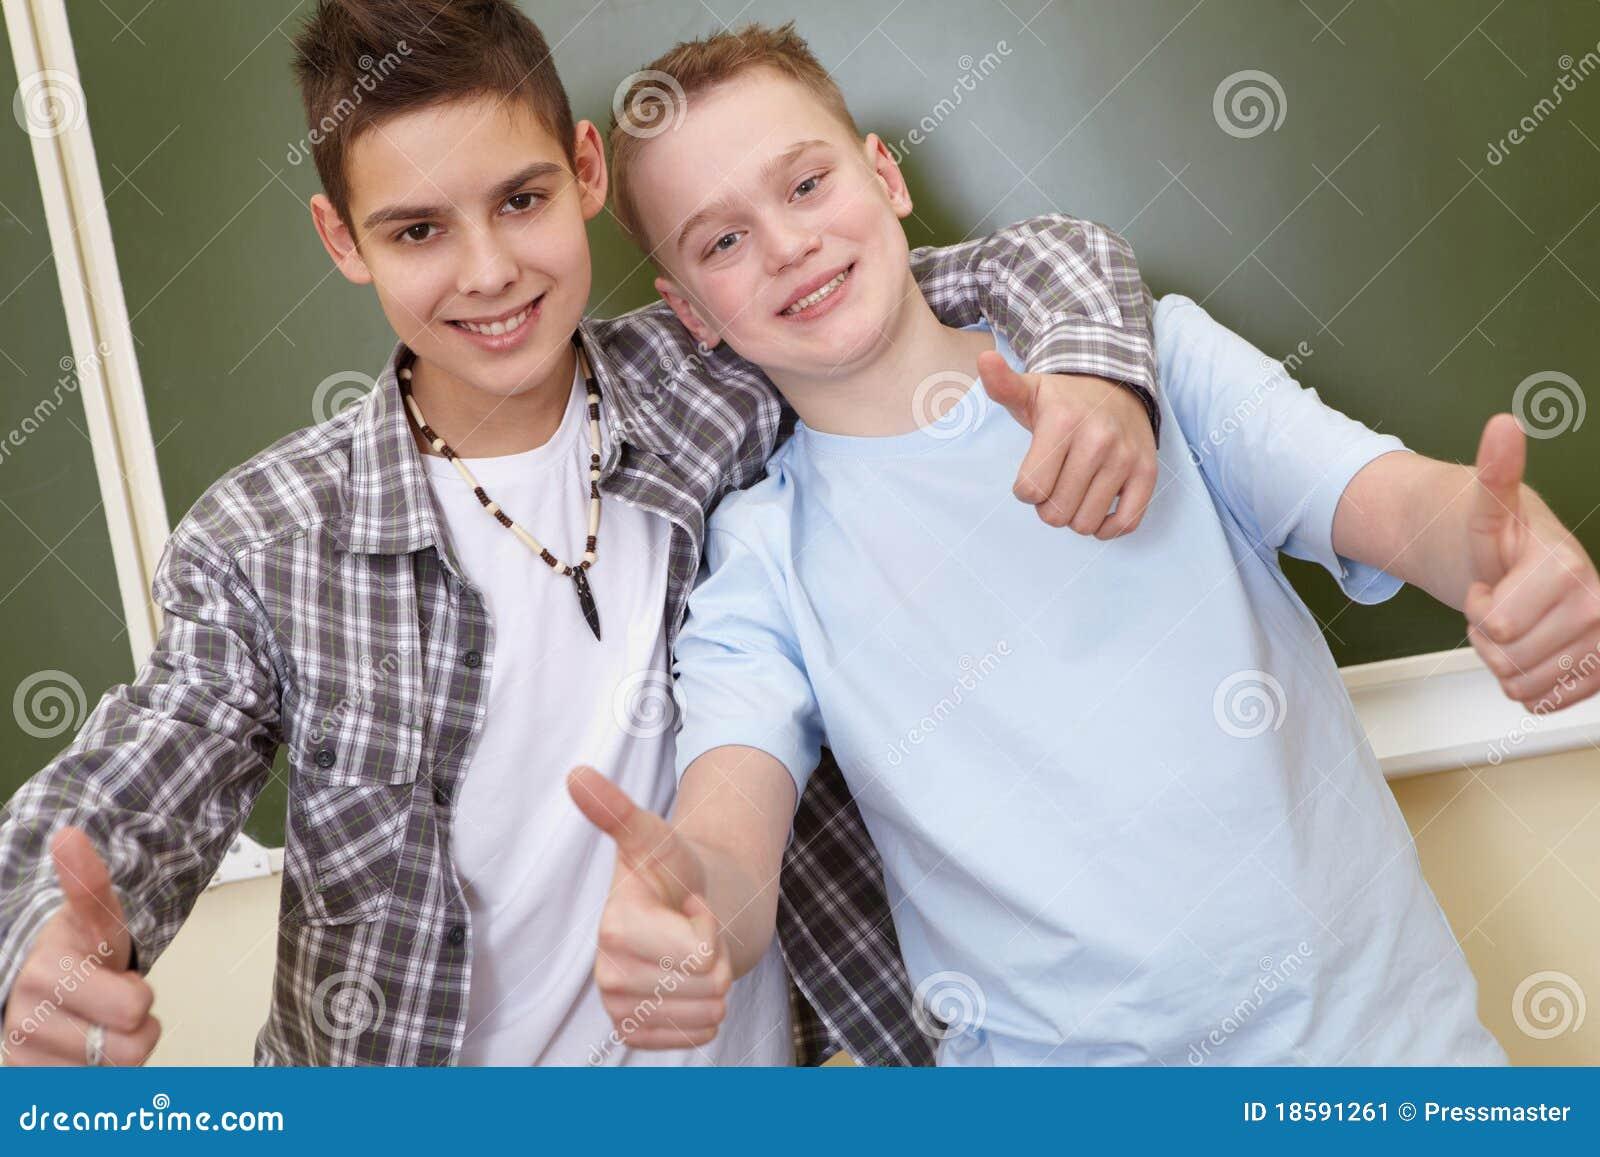 Successful Teen 5